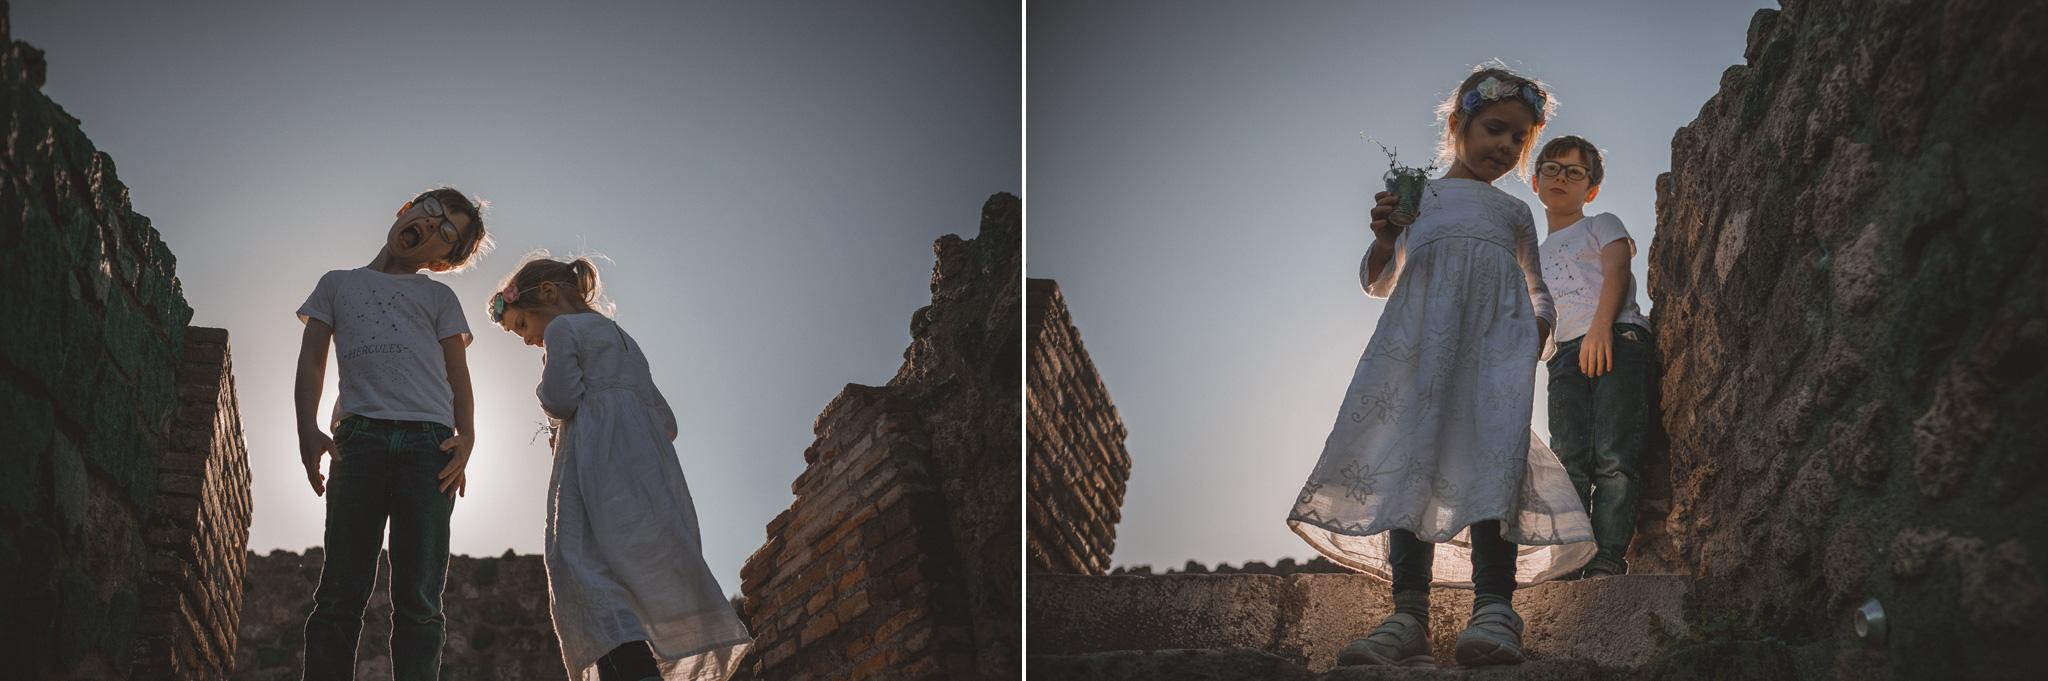 034-wedding-photographer-in-pompeii.jpg